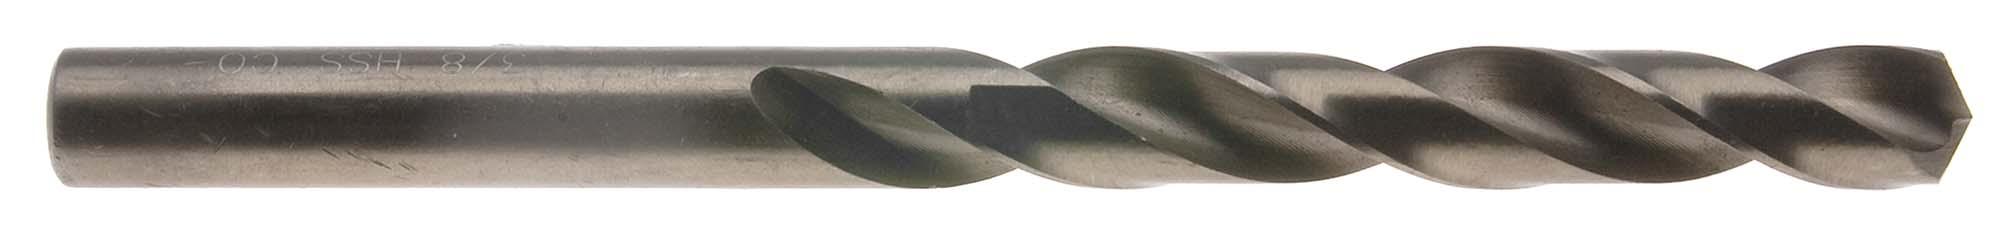 "7/16"" Cobalt Jobber Length Drill Bit"